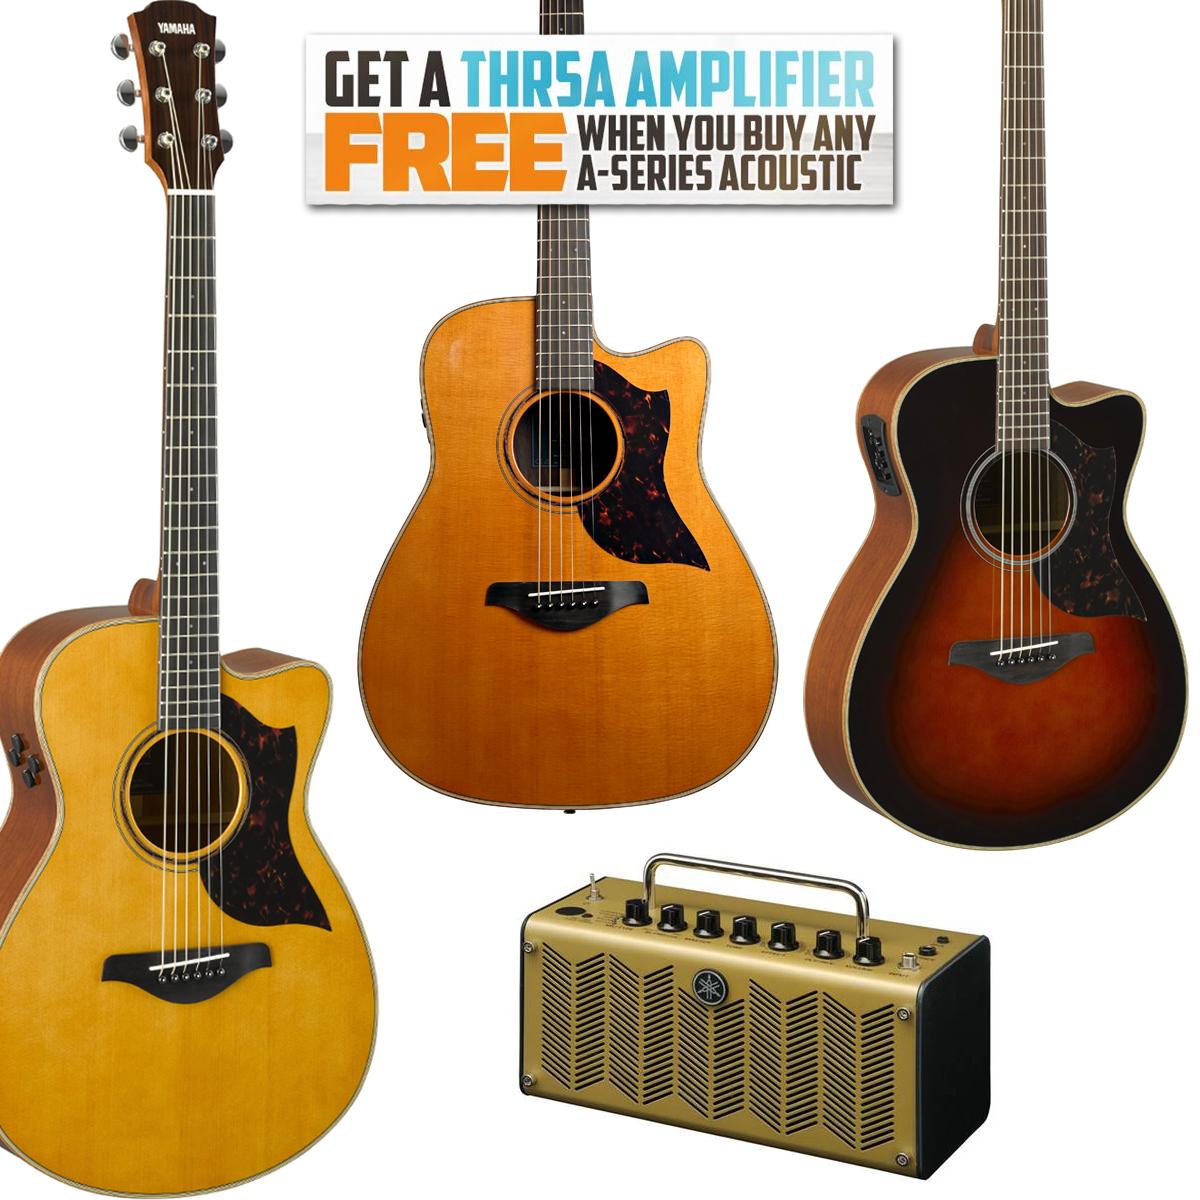 Yamaha Acoustic Guitars + Free THR5A Amp - Yamaha AC1MIITBS £529 / Yamaha AC3M ARE Solid Top, Back & Sides - £699 @ Guitar Guitar